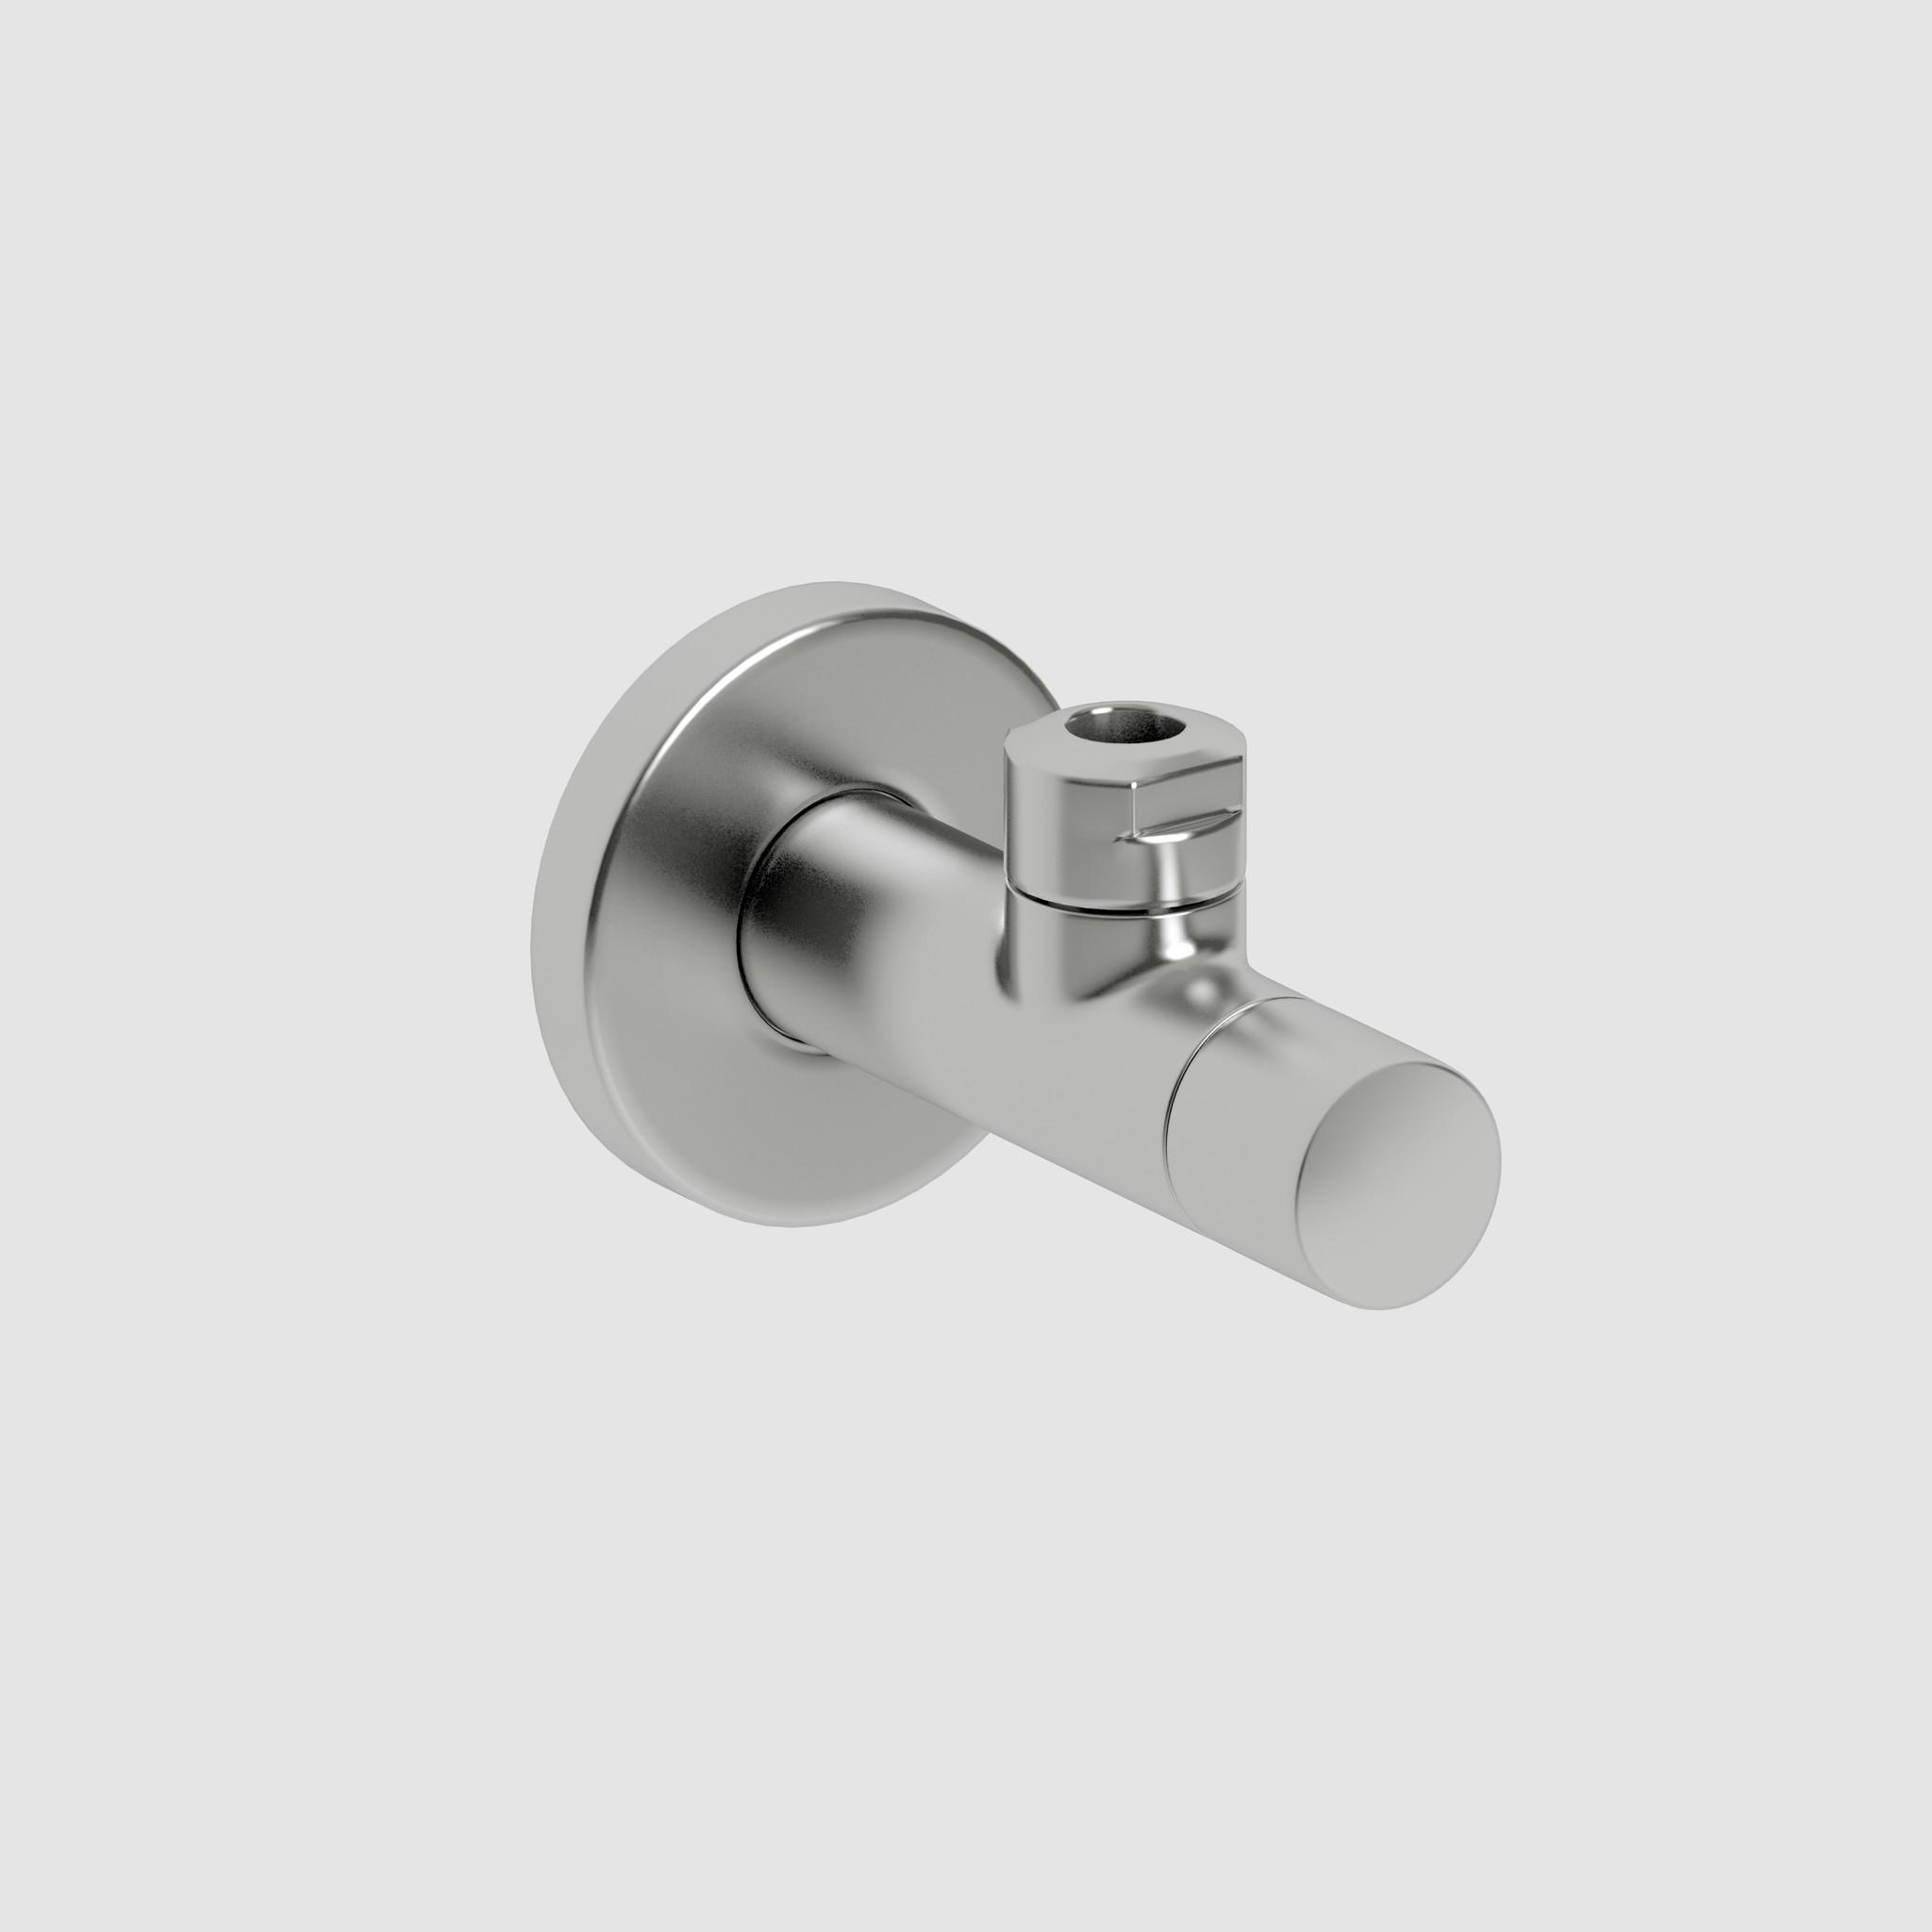 HighTech Marathon 2 design angle valve, brushed stainless steel